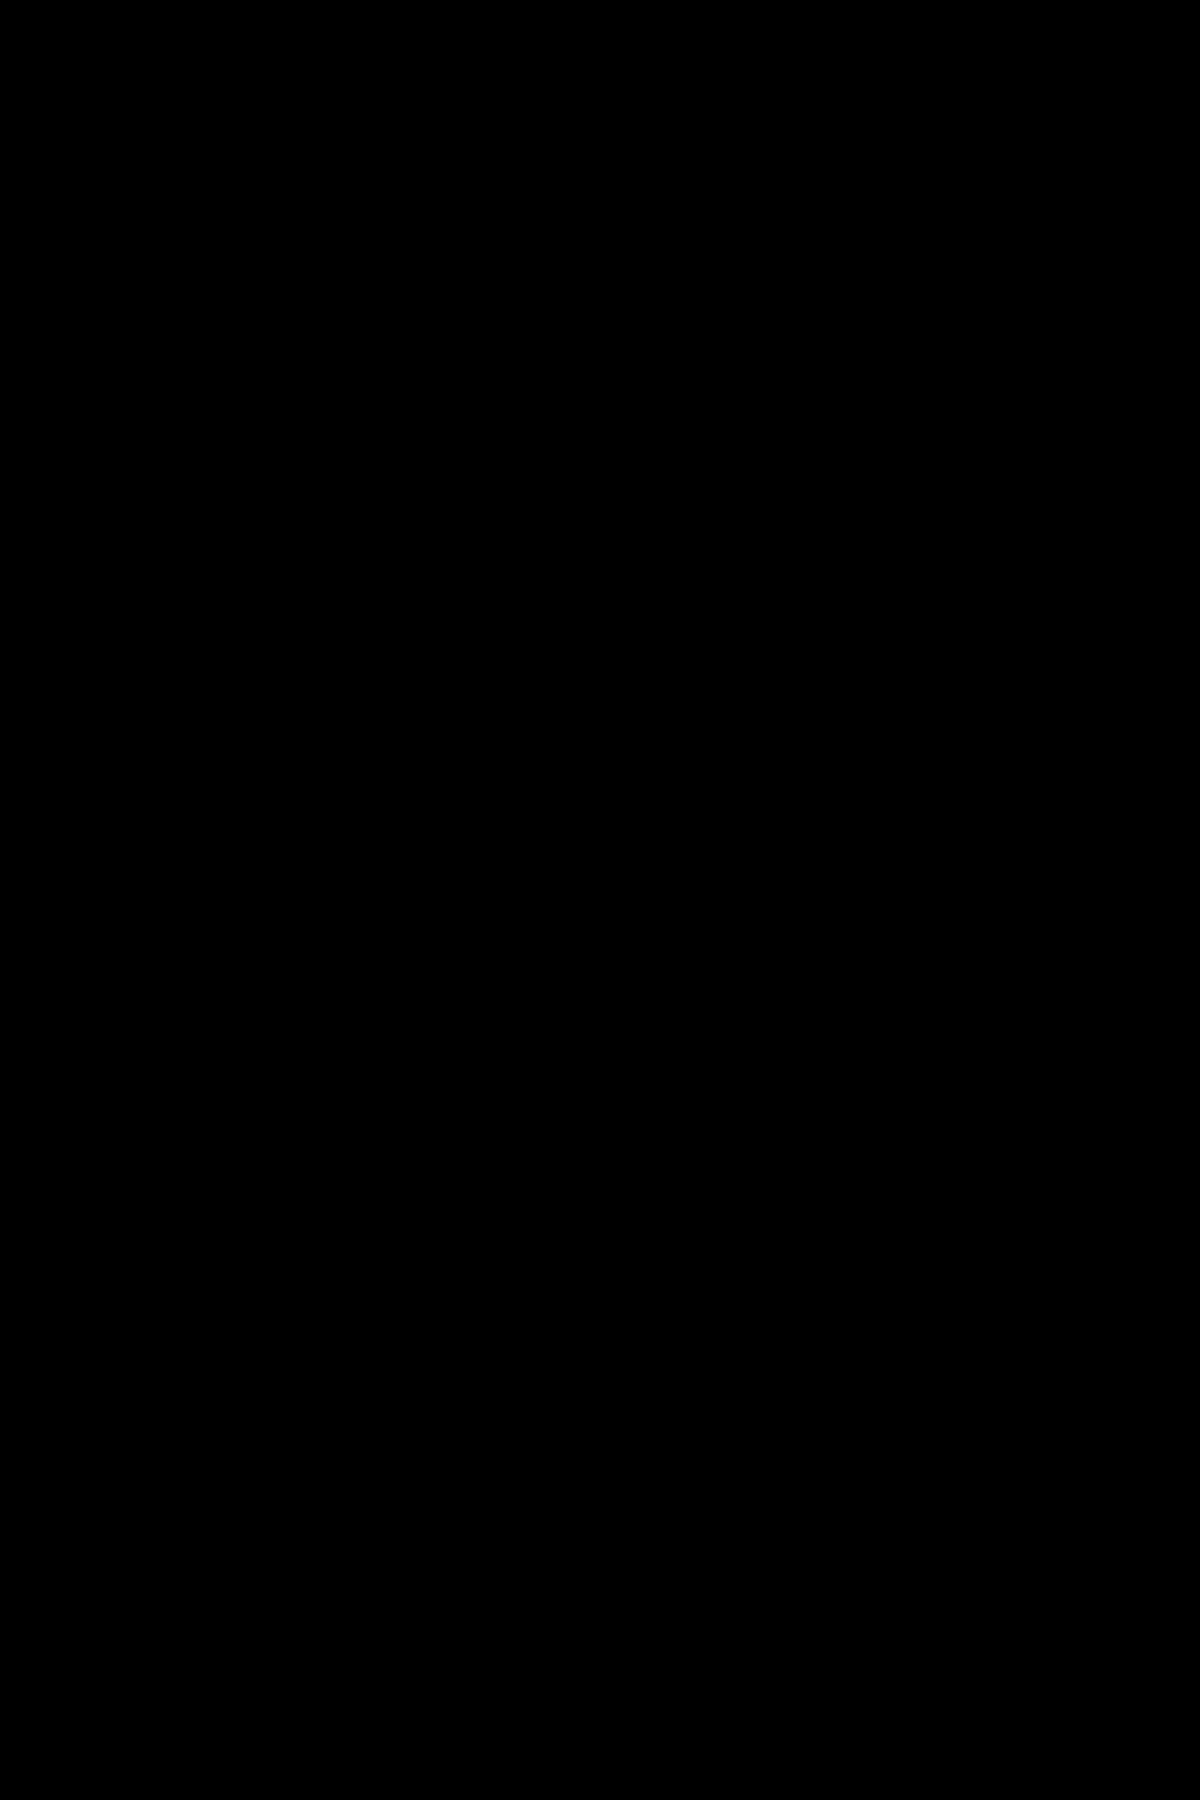 JamJar-33